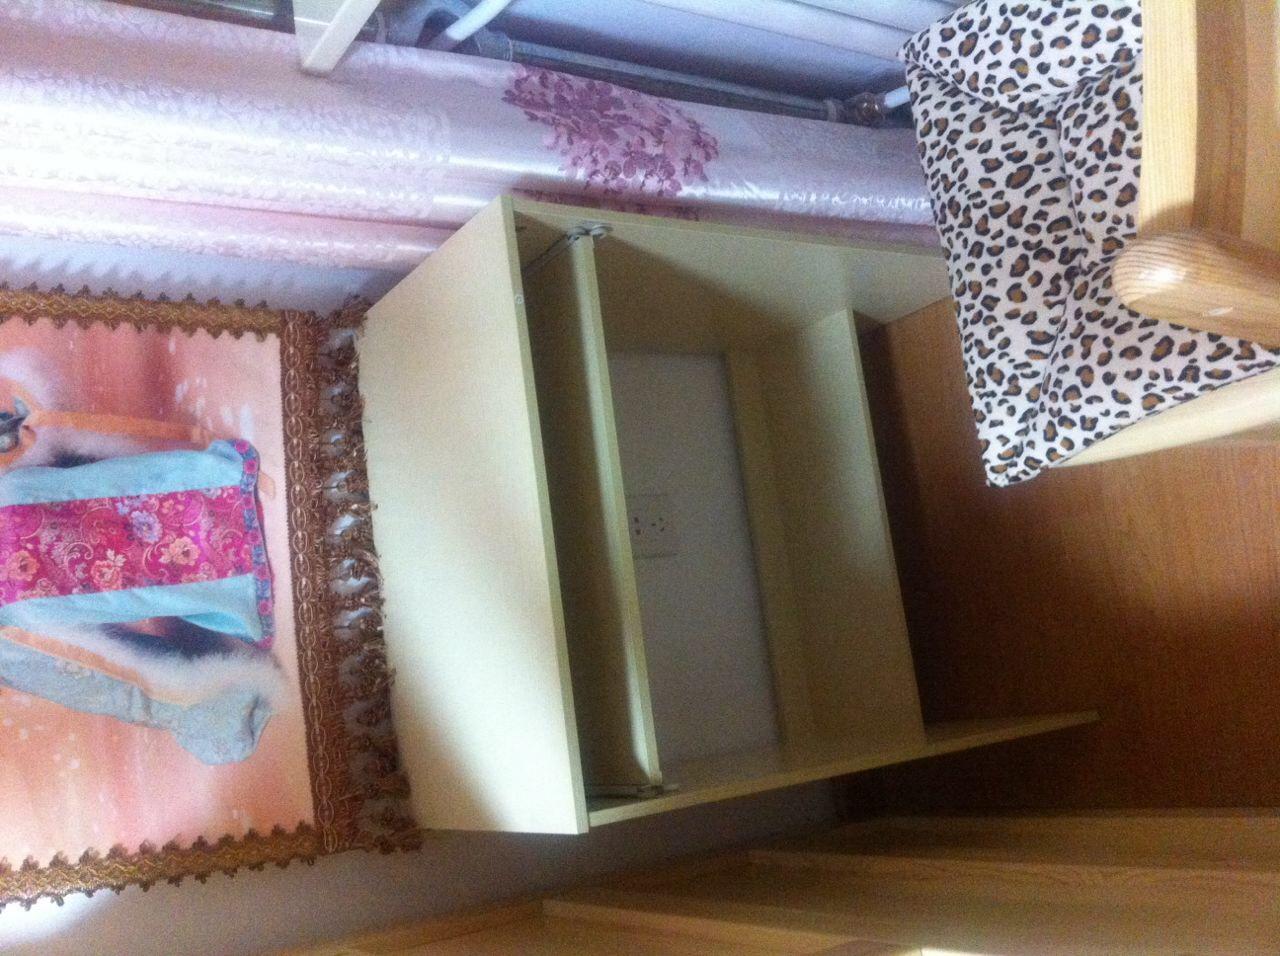 jordans retro 13 pink and grey 00252712 onlineshop